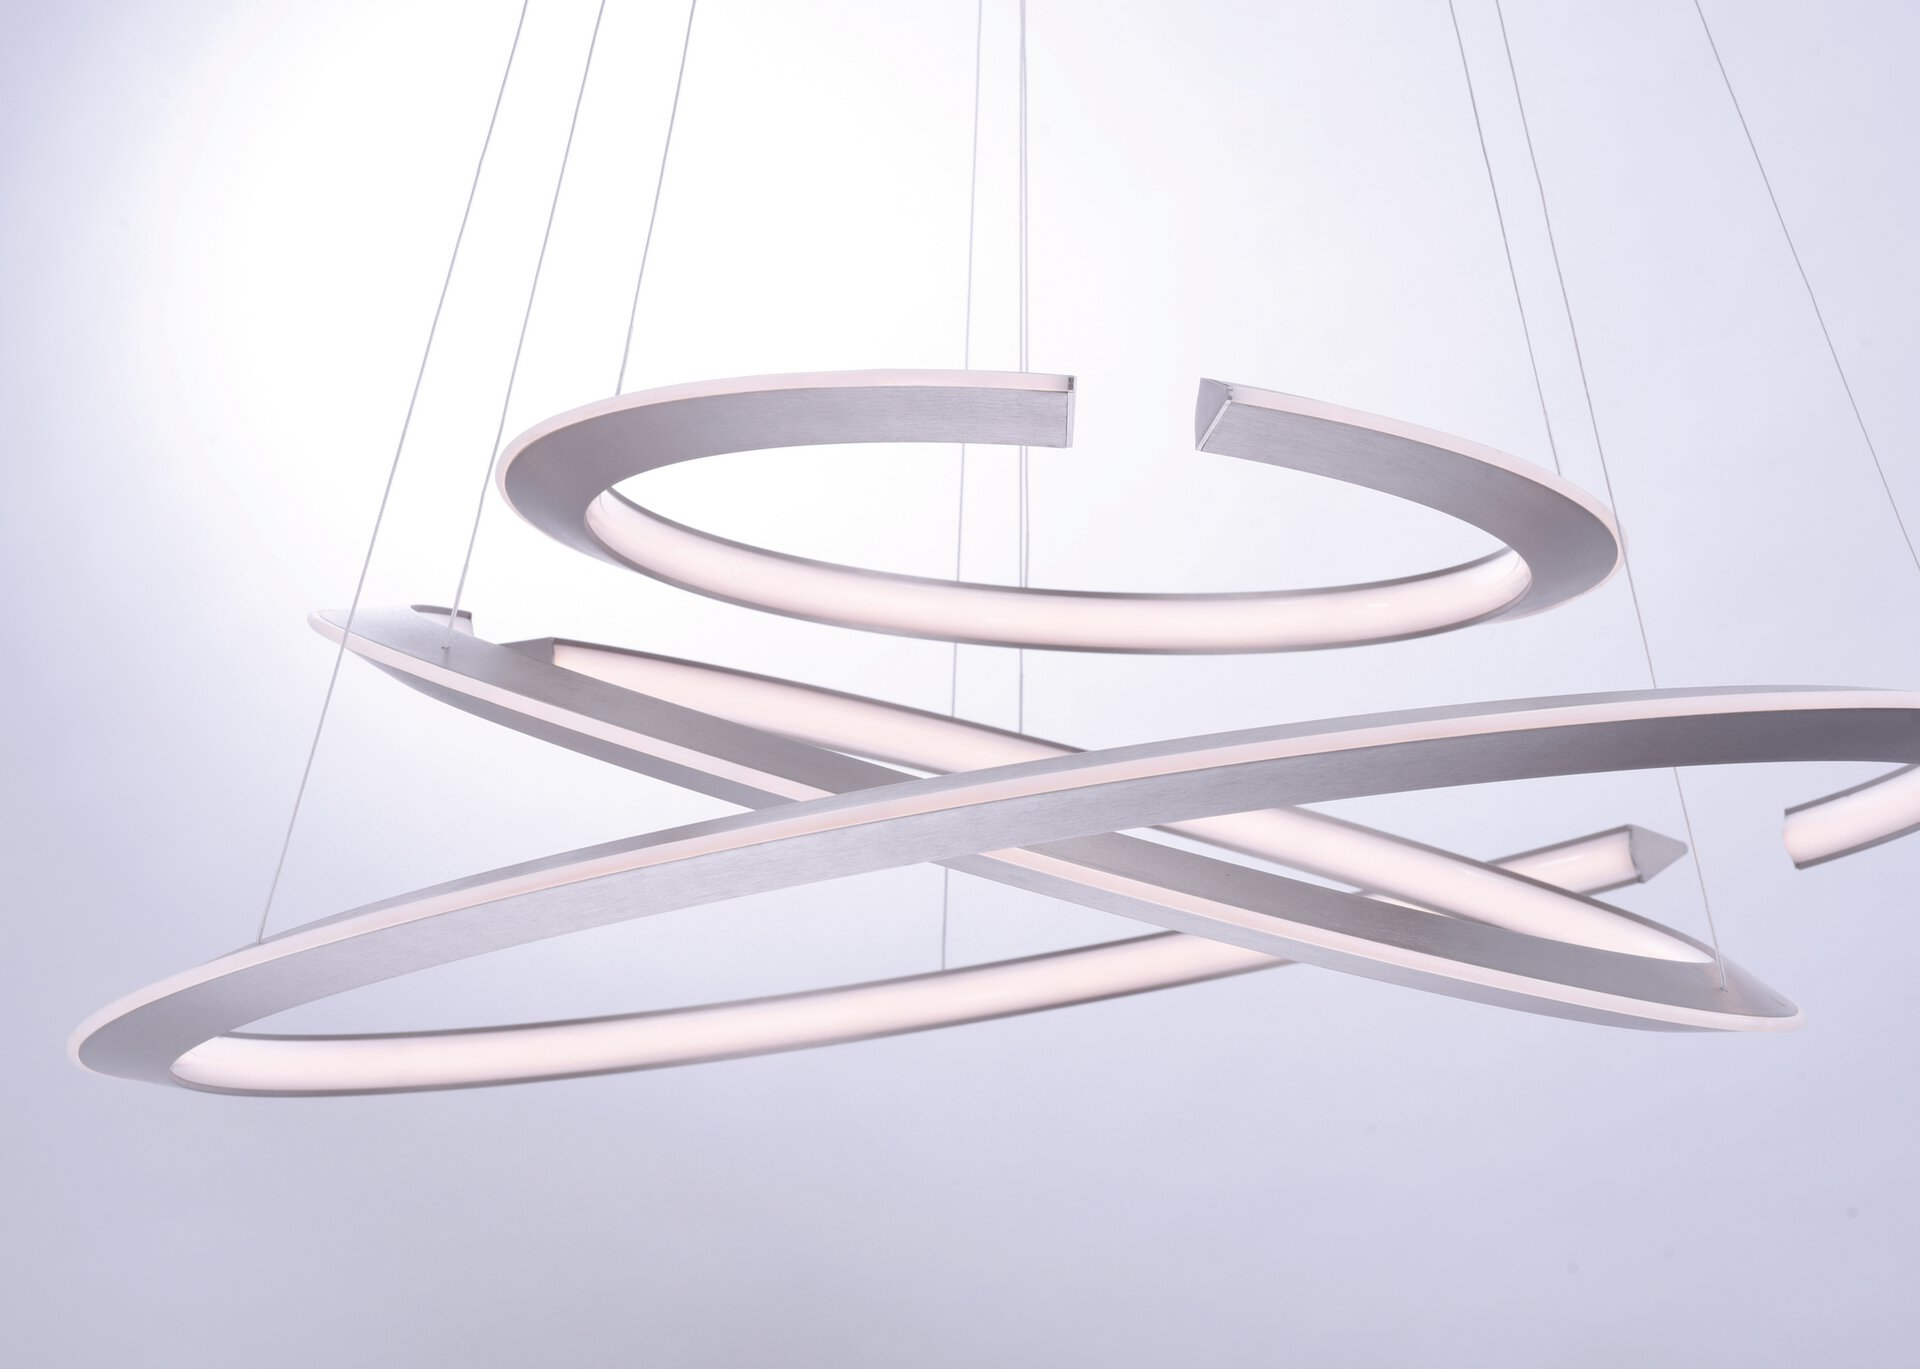 Hängeleuchte ALESSA Paul Neuhaus Metall silber 93 x 200 x 93 cm